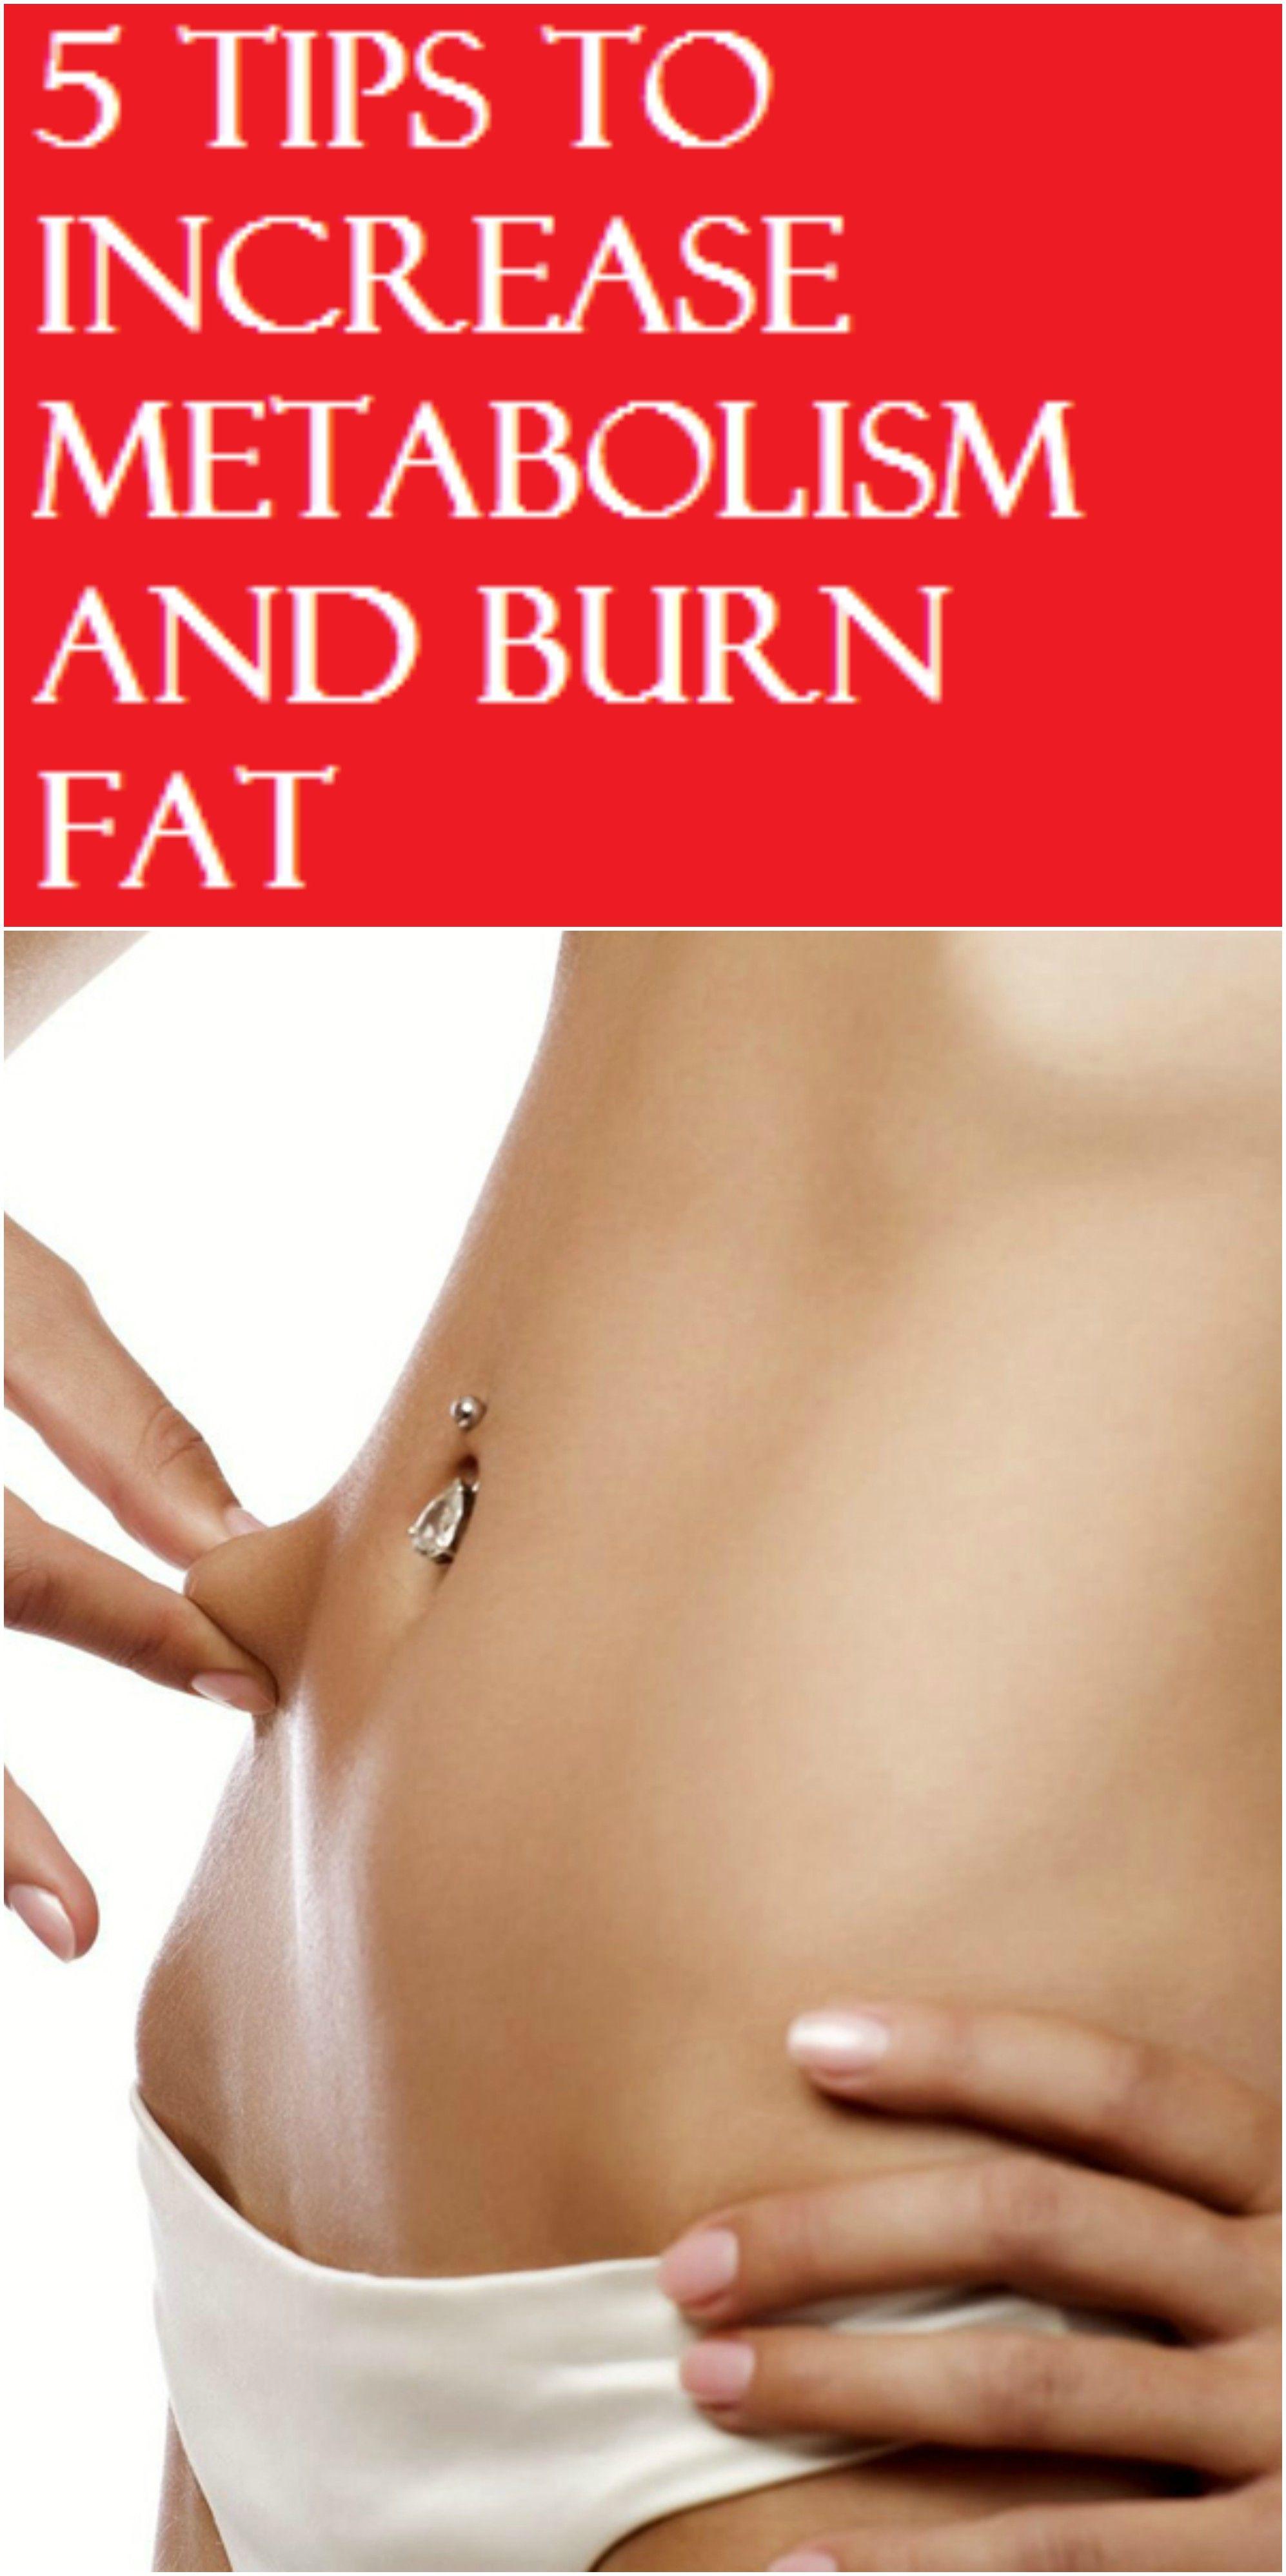 Xls medical weight loss image 10